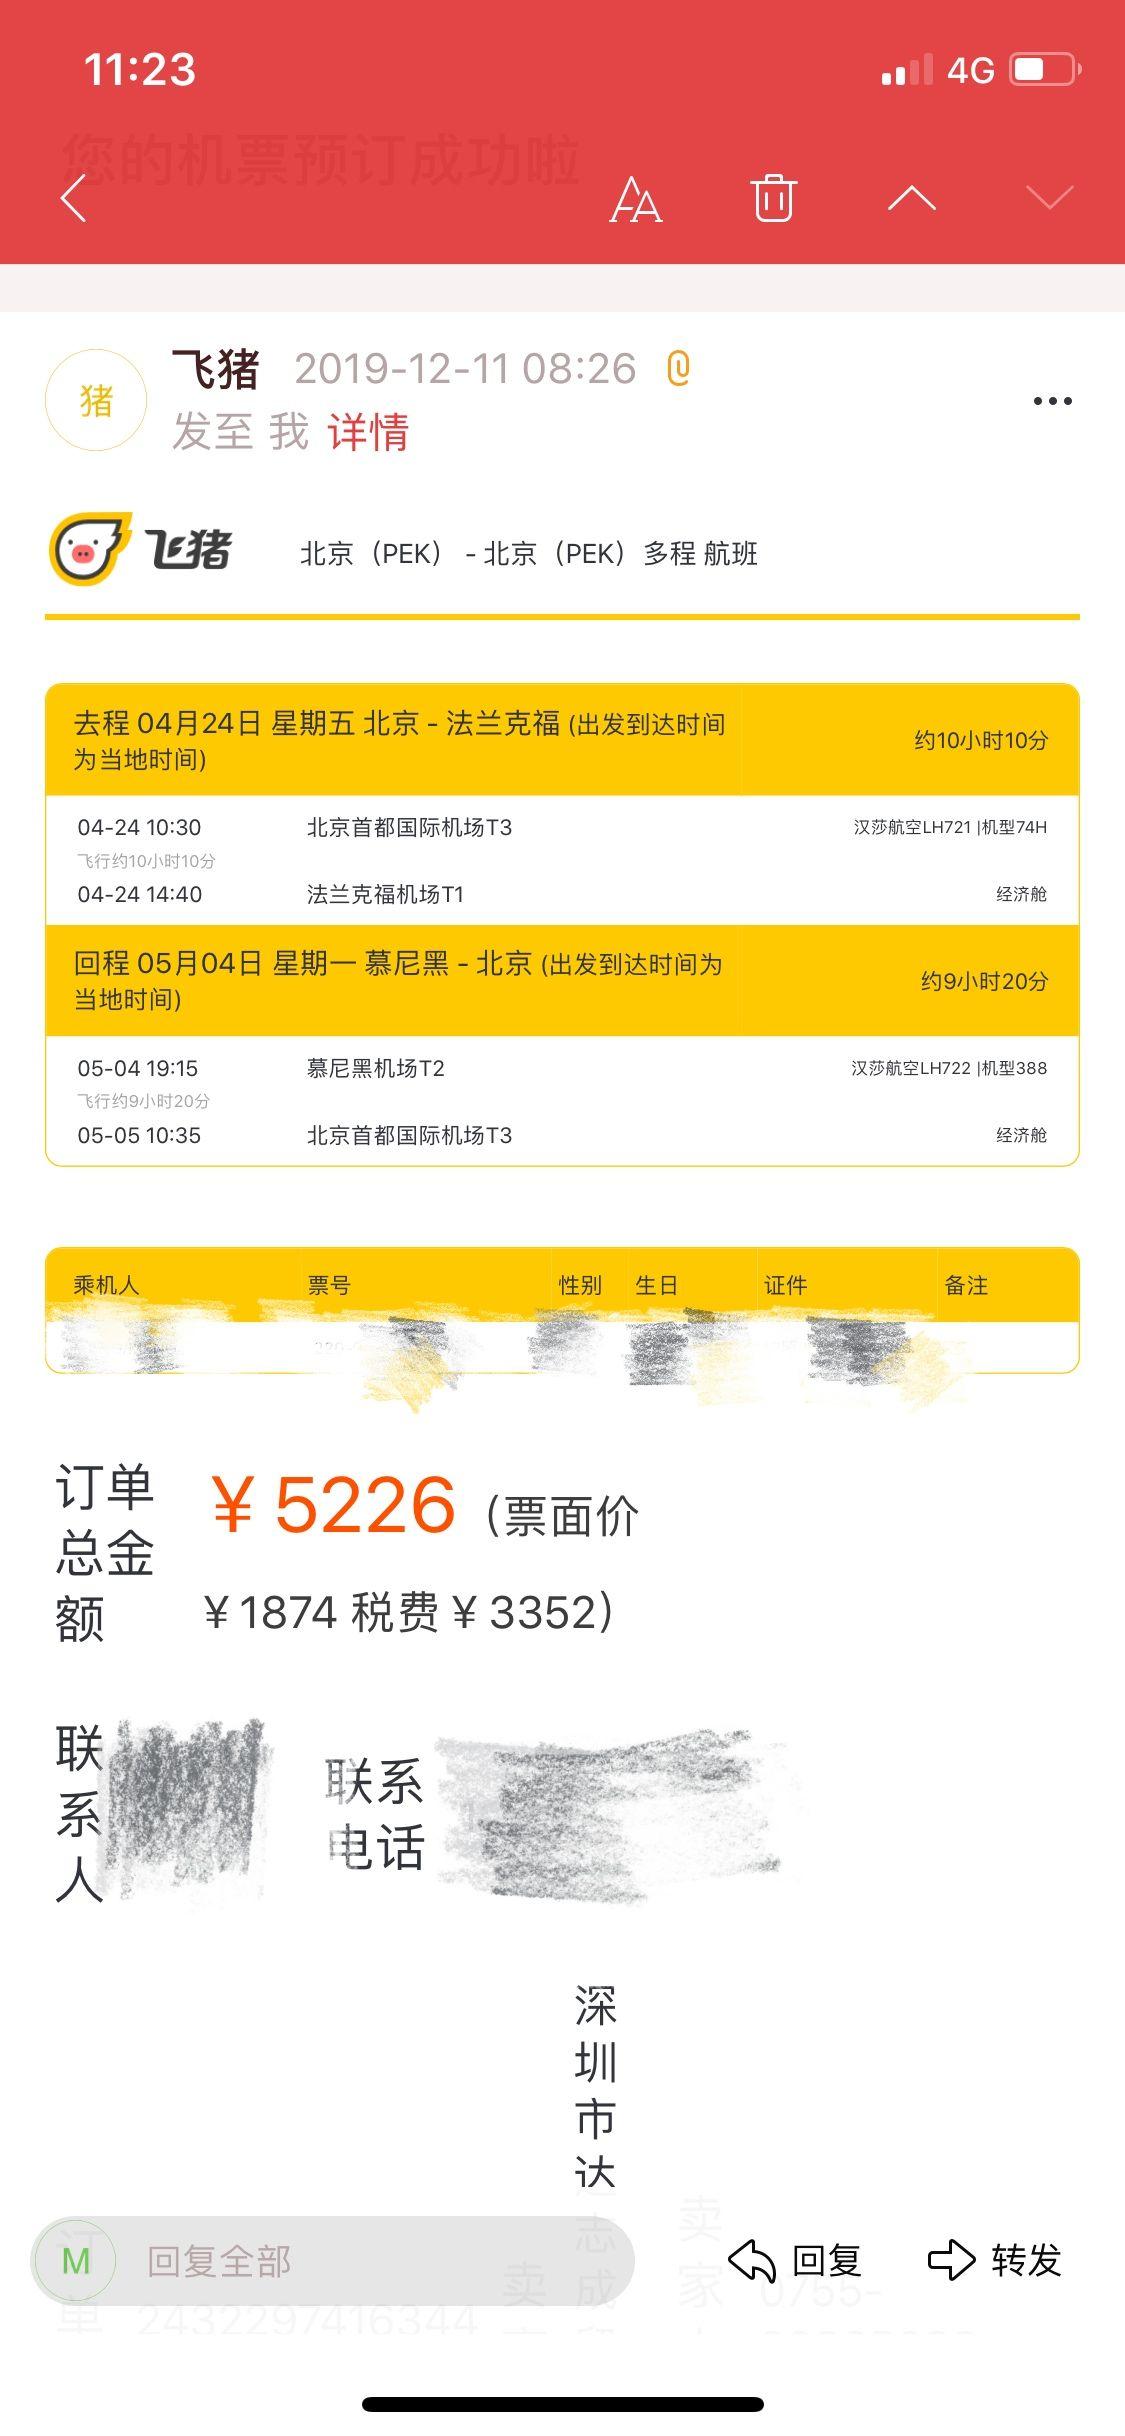 卡锁F6A6C984A-6698